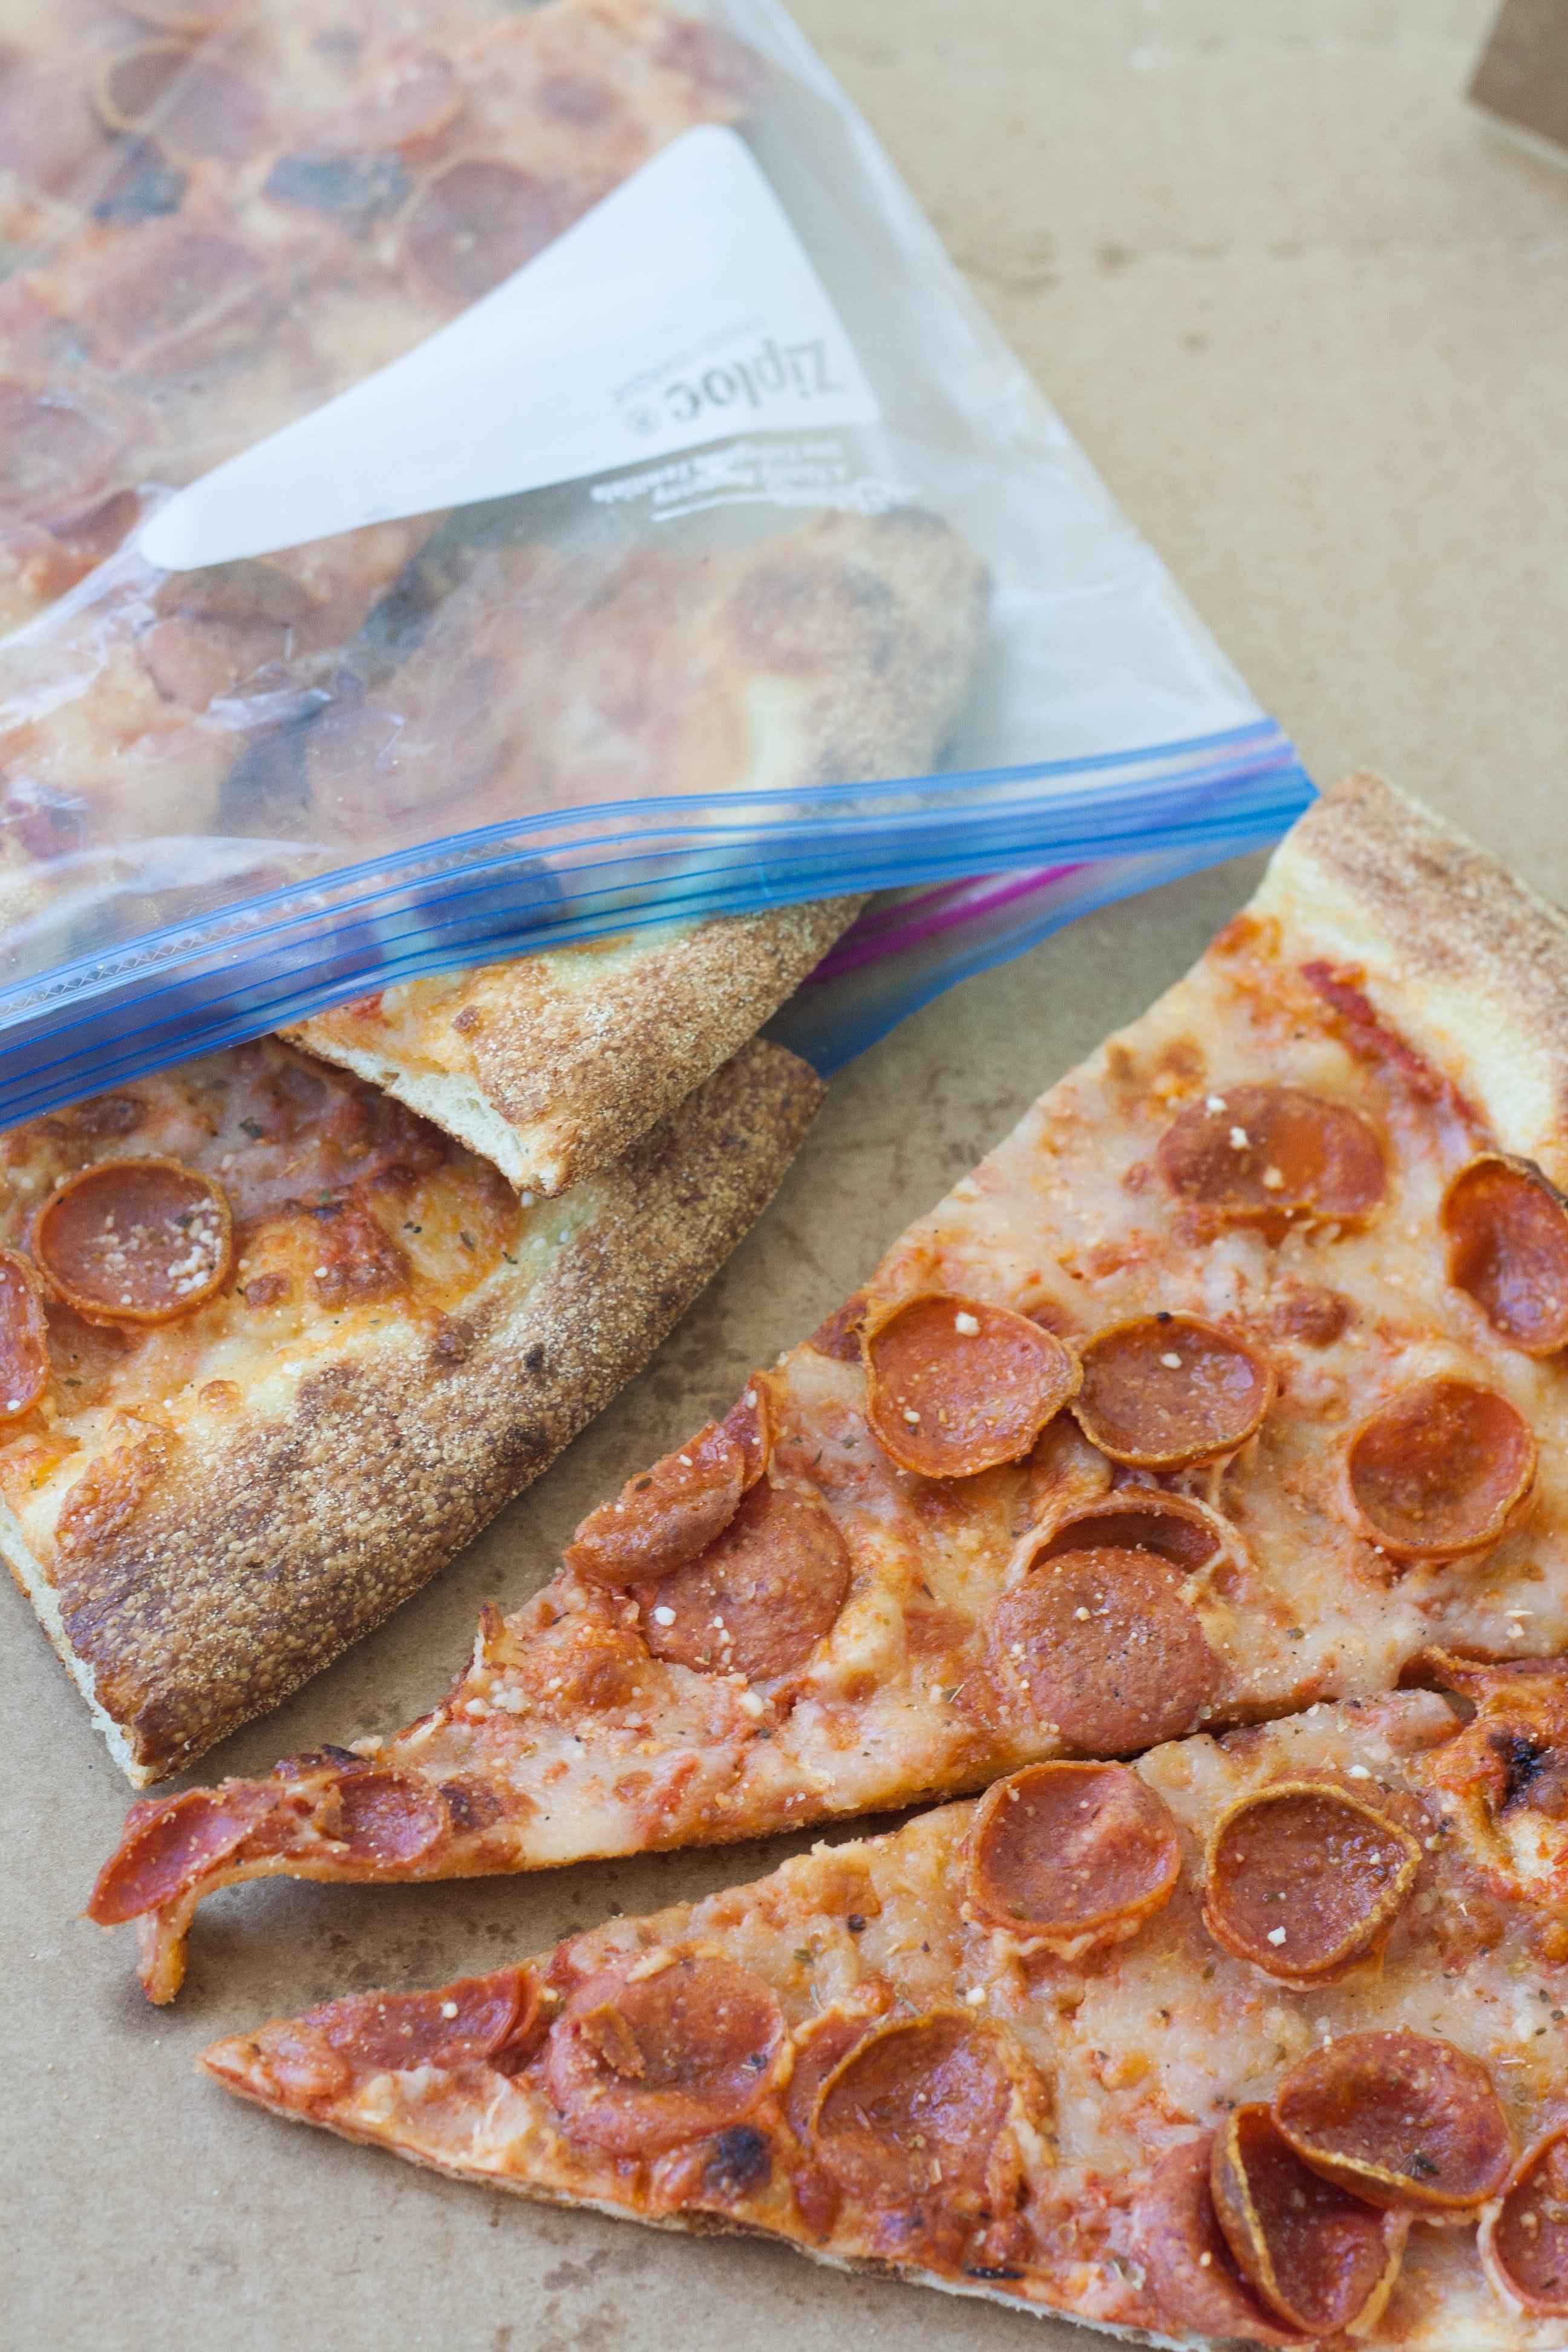 Storing leftover pepperoni pizza